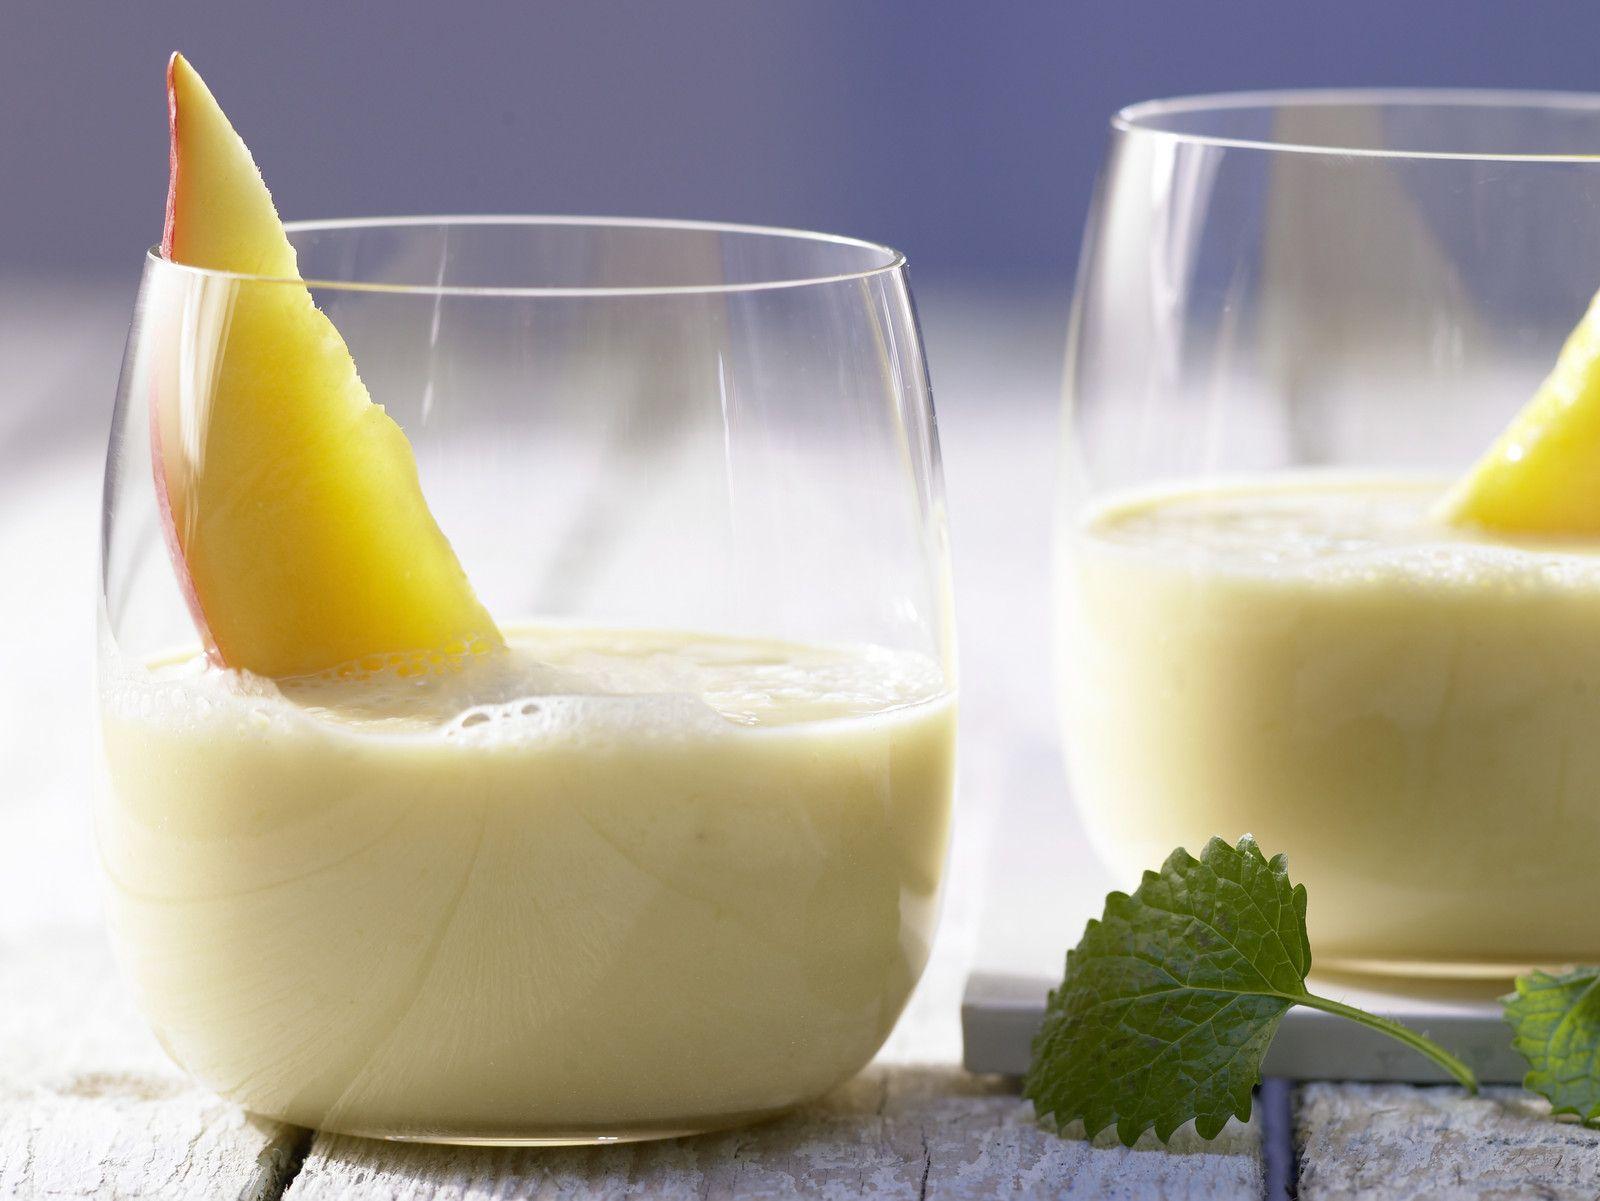 Mango-Bananen-Drink Rezept | EAT SMARTER